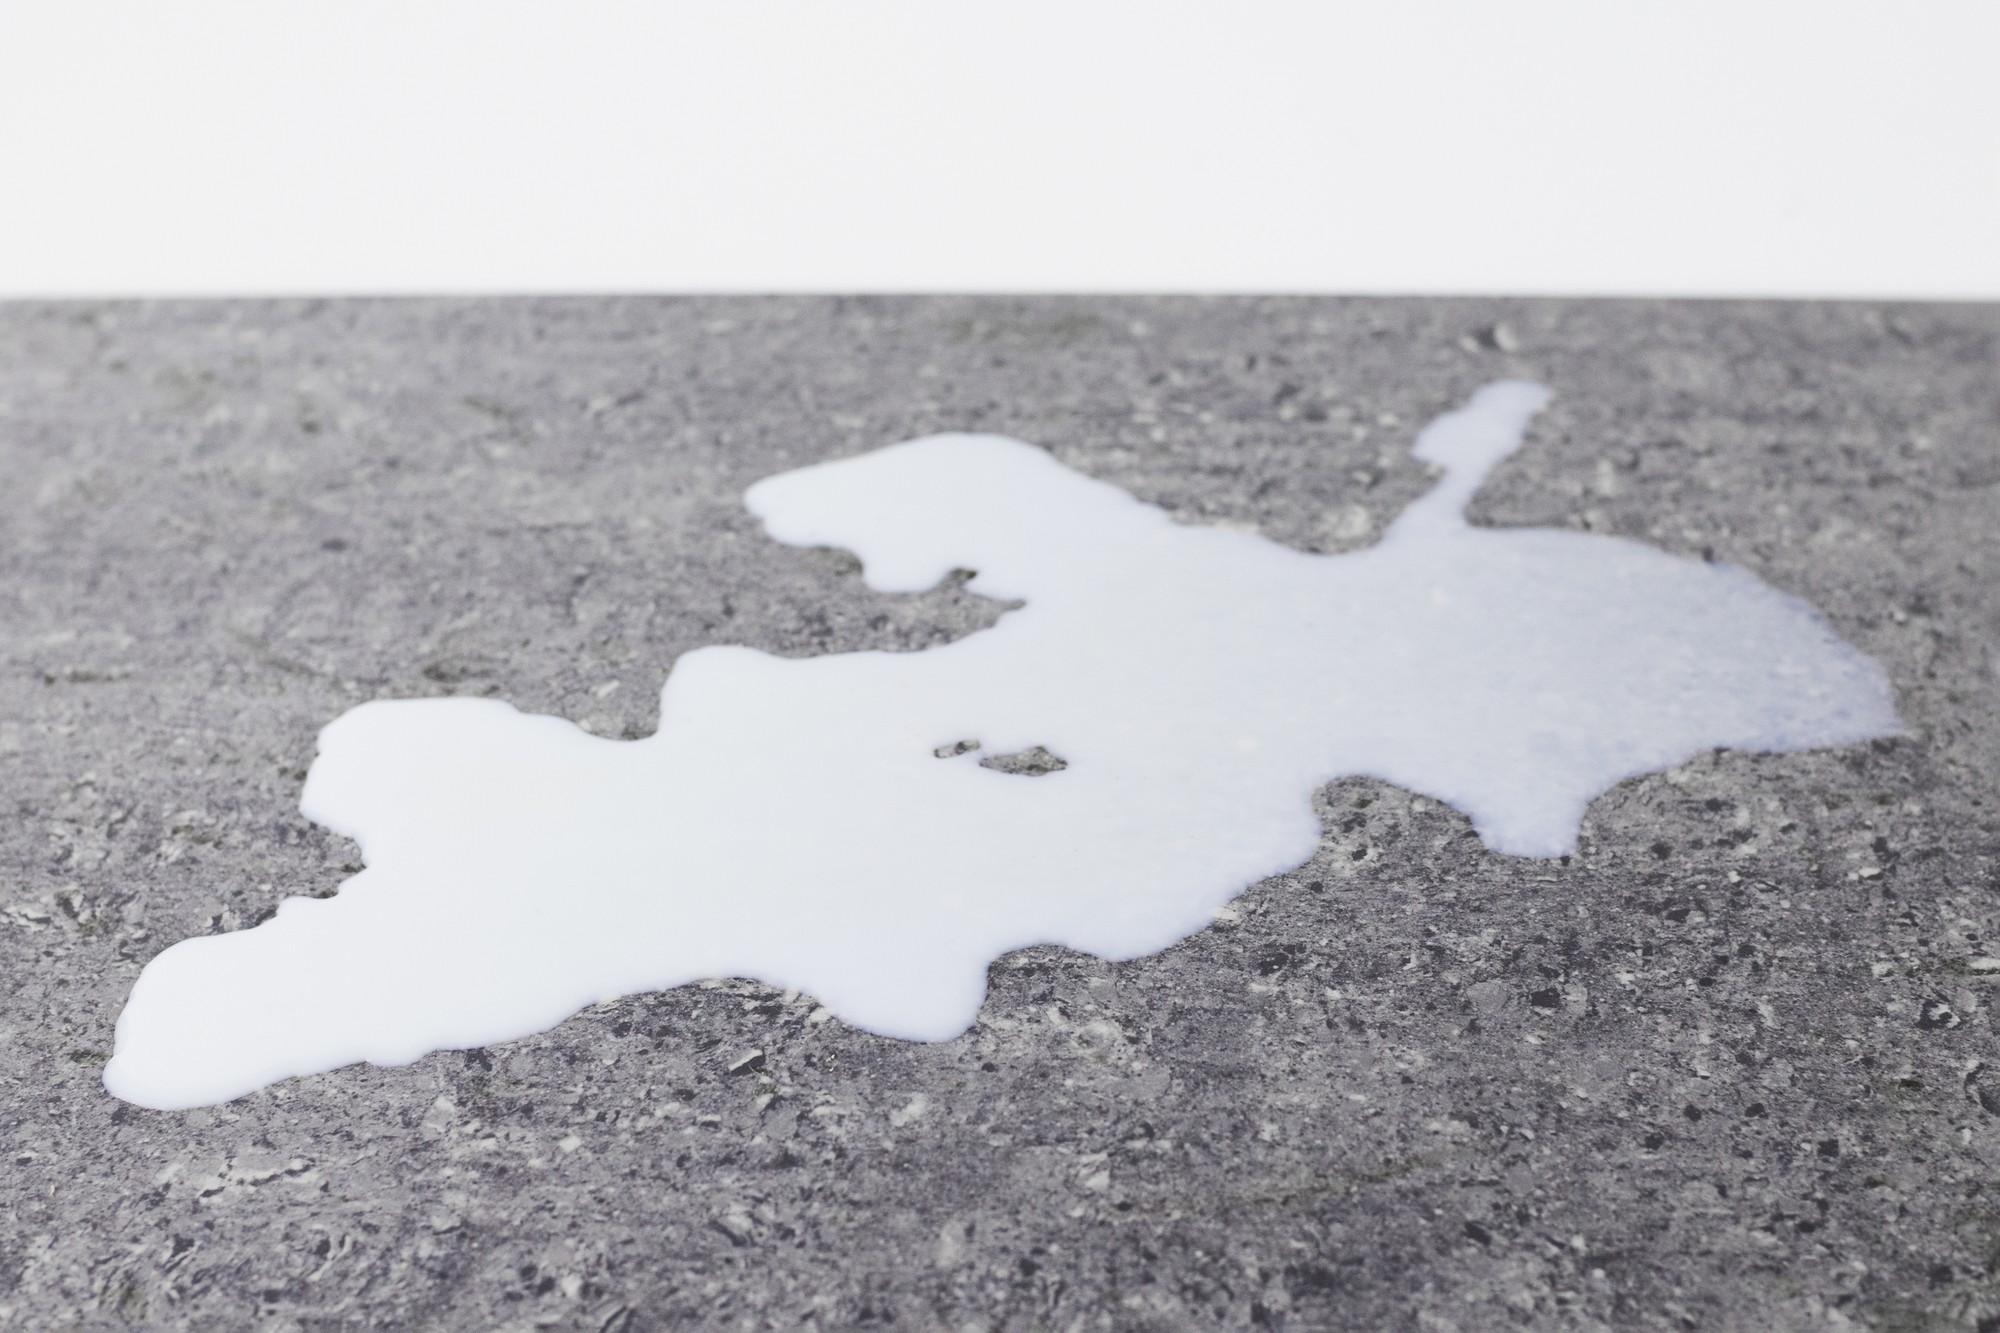 milk spilled on textured surface